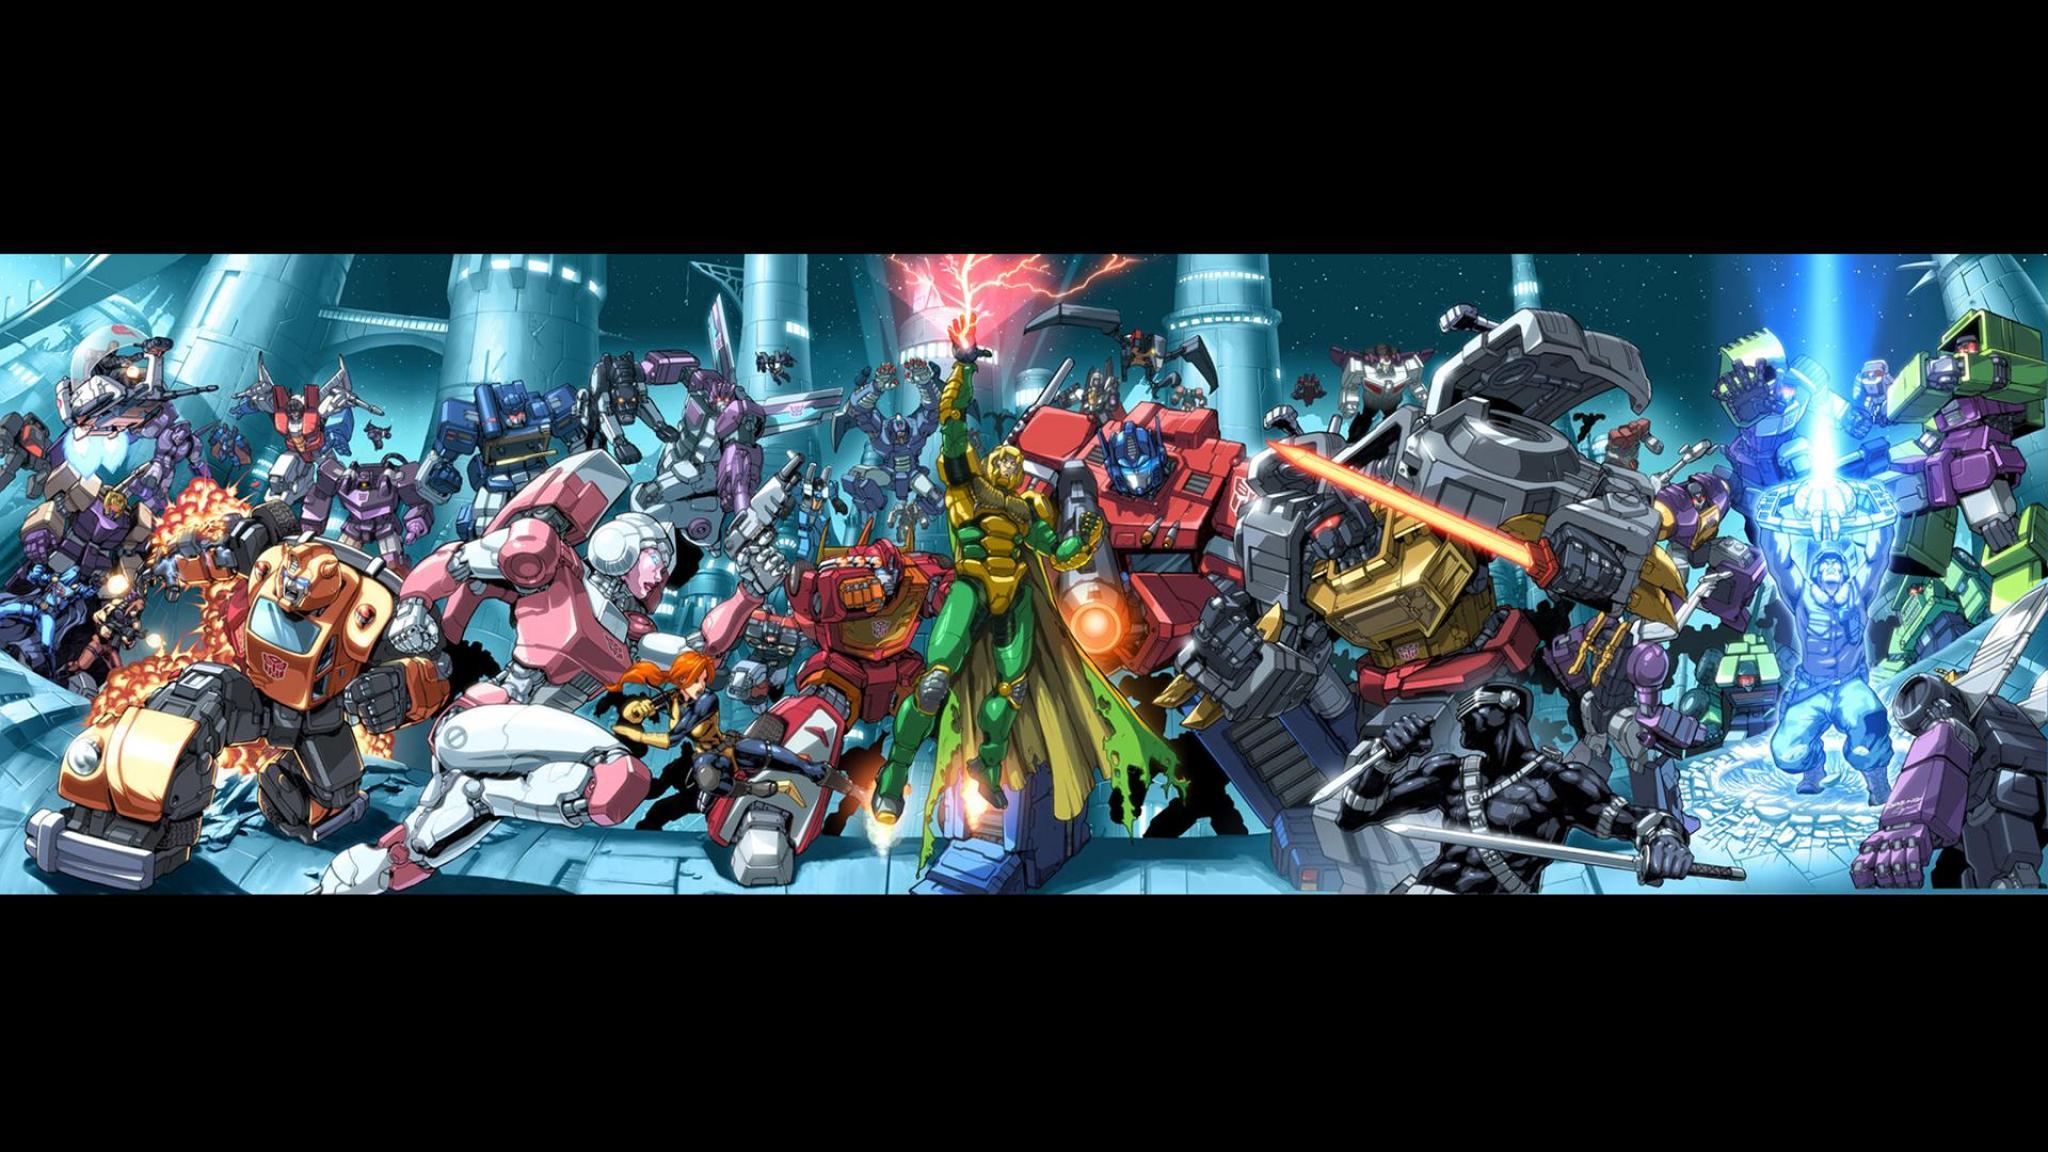 Transformers Optimus prime Gi joe Fiora Snake eyes 2048x1152